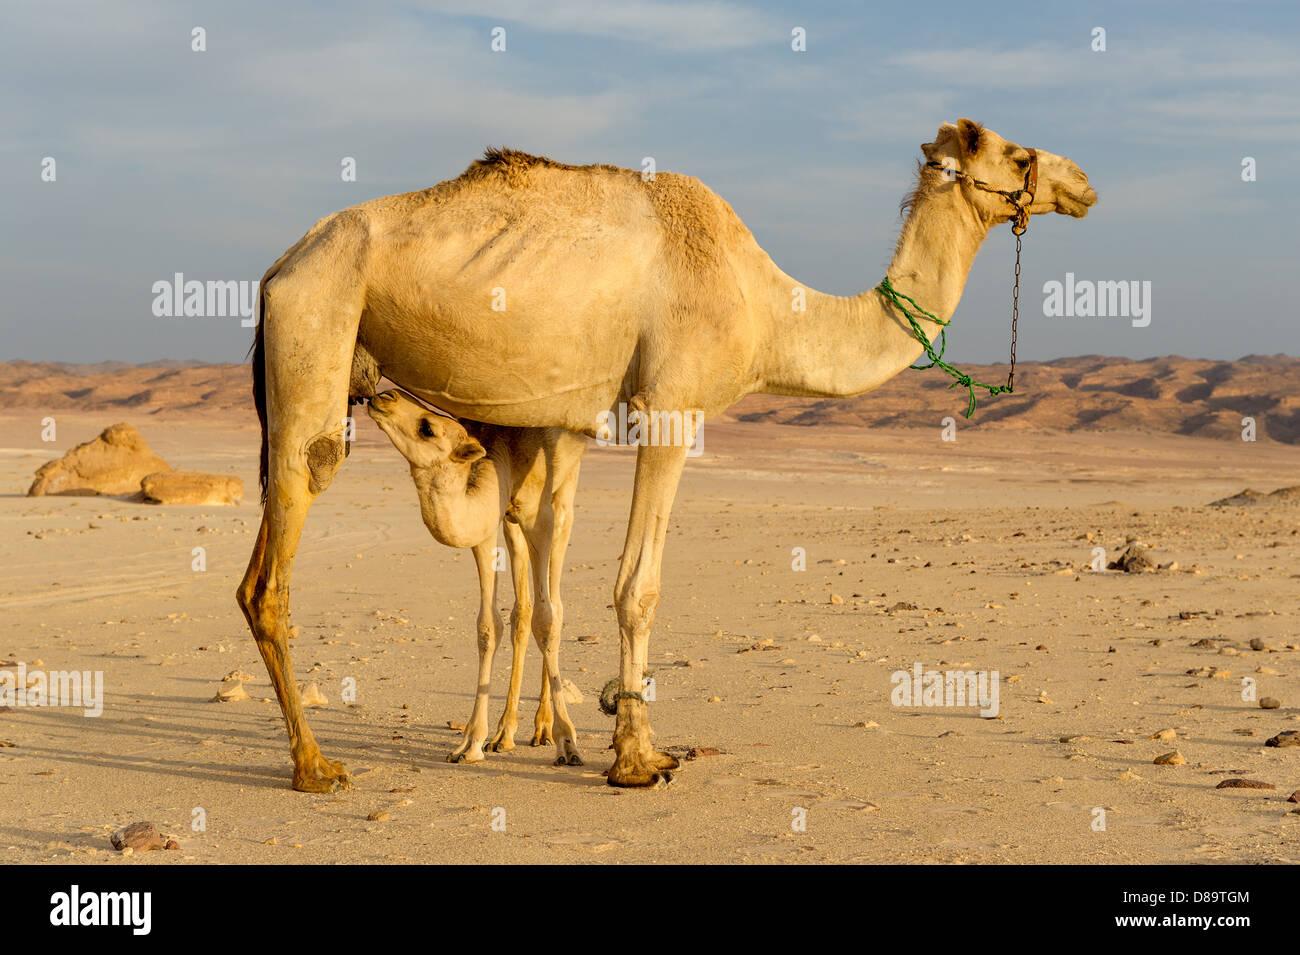 72563b7bd831 Neugeborenes Kamel Stockfotos & Neugeborenes Kamel Bilder - Alamy